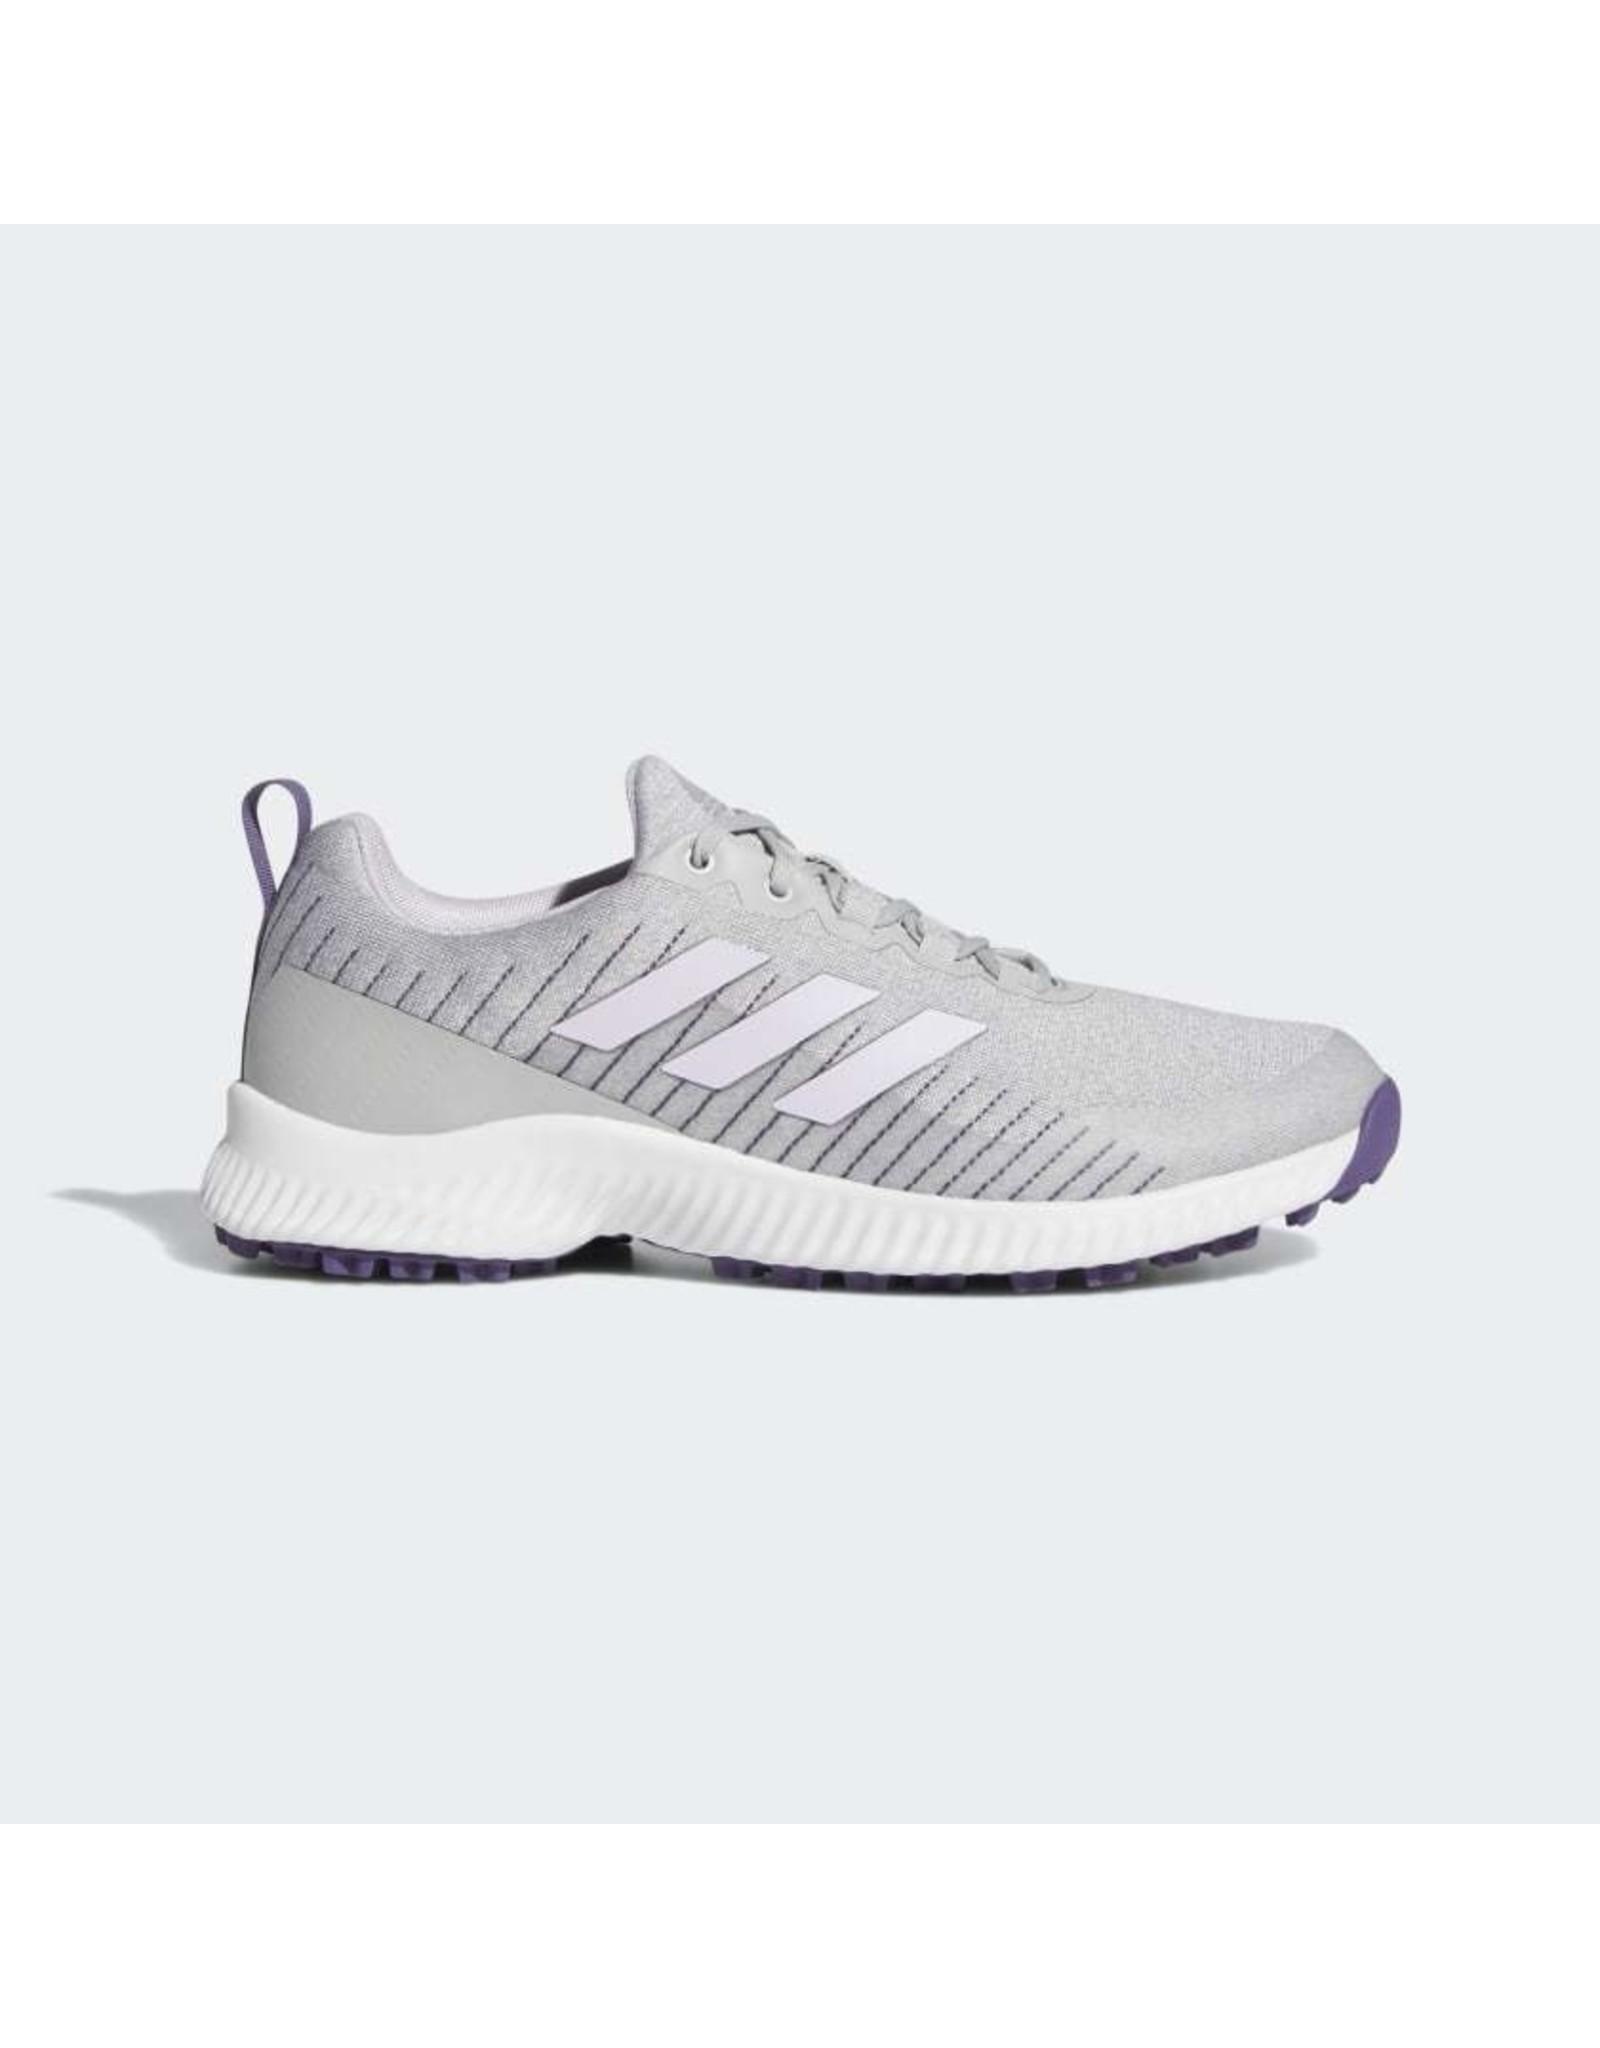 Adidas Adidas Women's Response Bounce 2.0 SL Grey